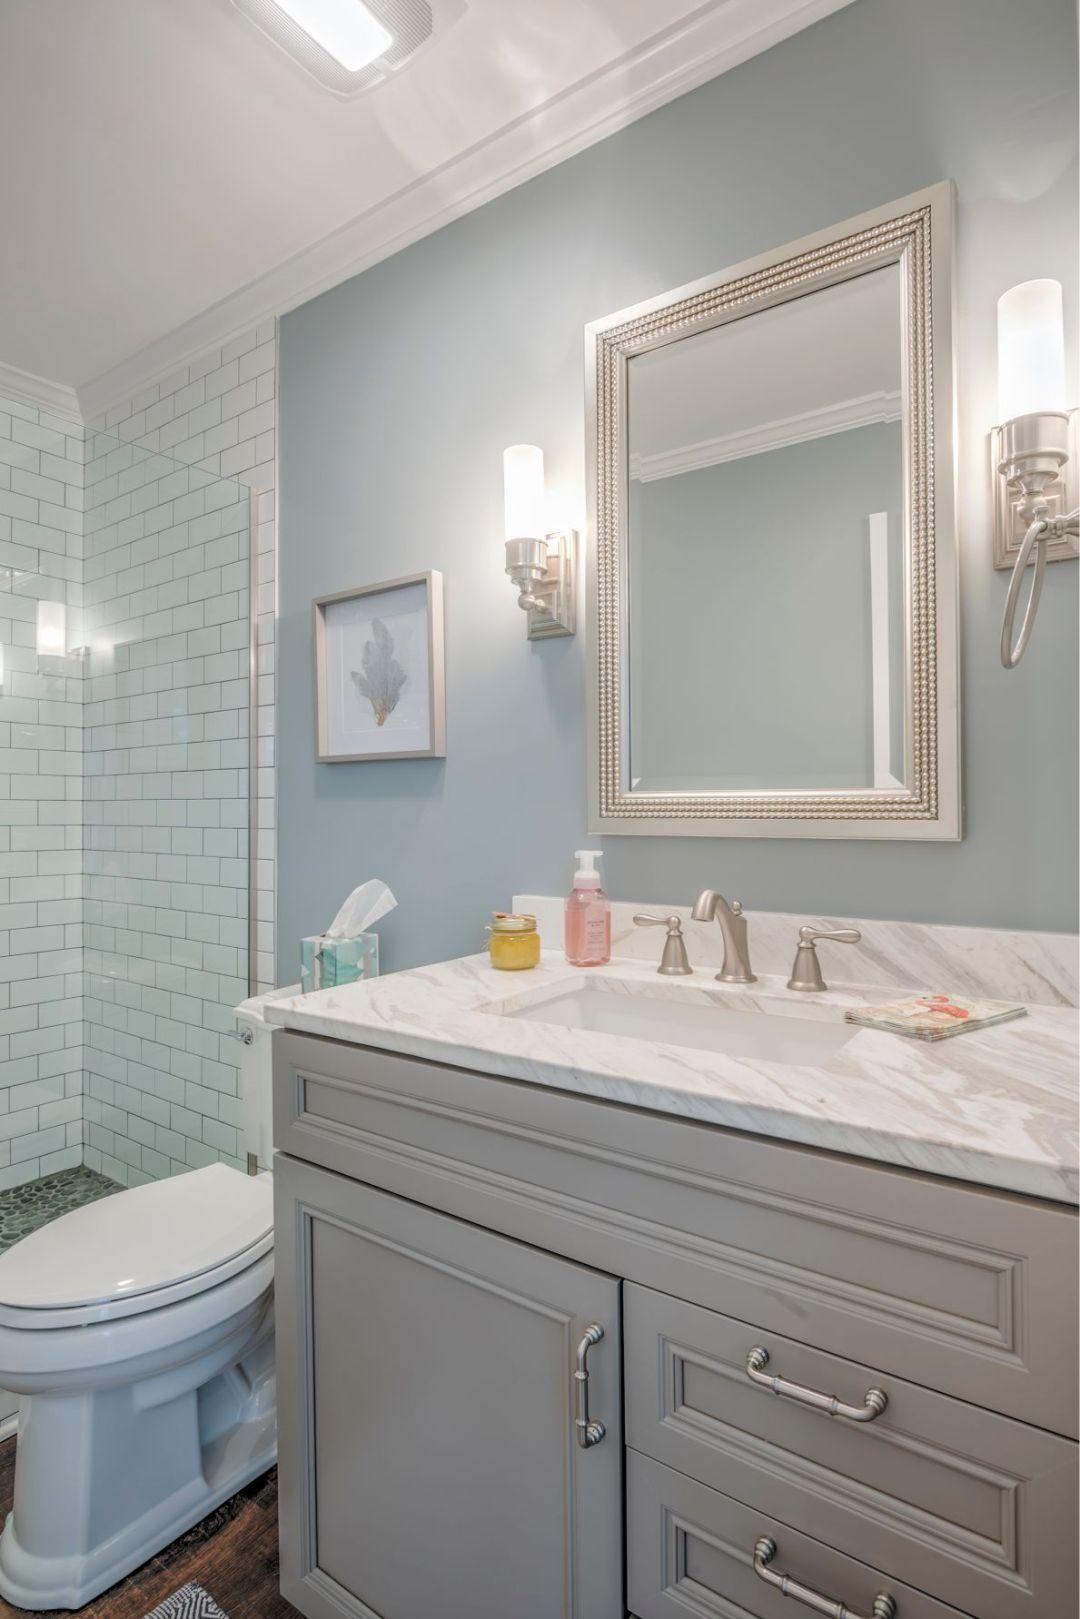 Bathroom Remodel in Kings Grant, Fenwick Island DE with Misty Memories Wall Paint